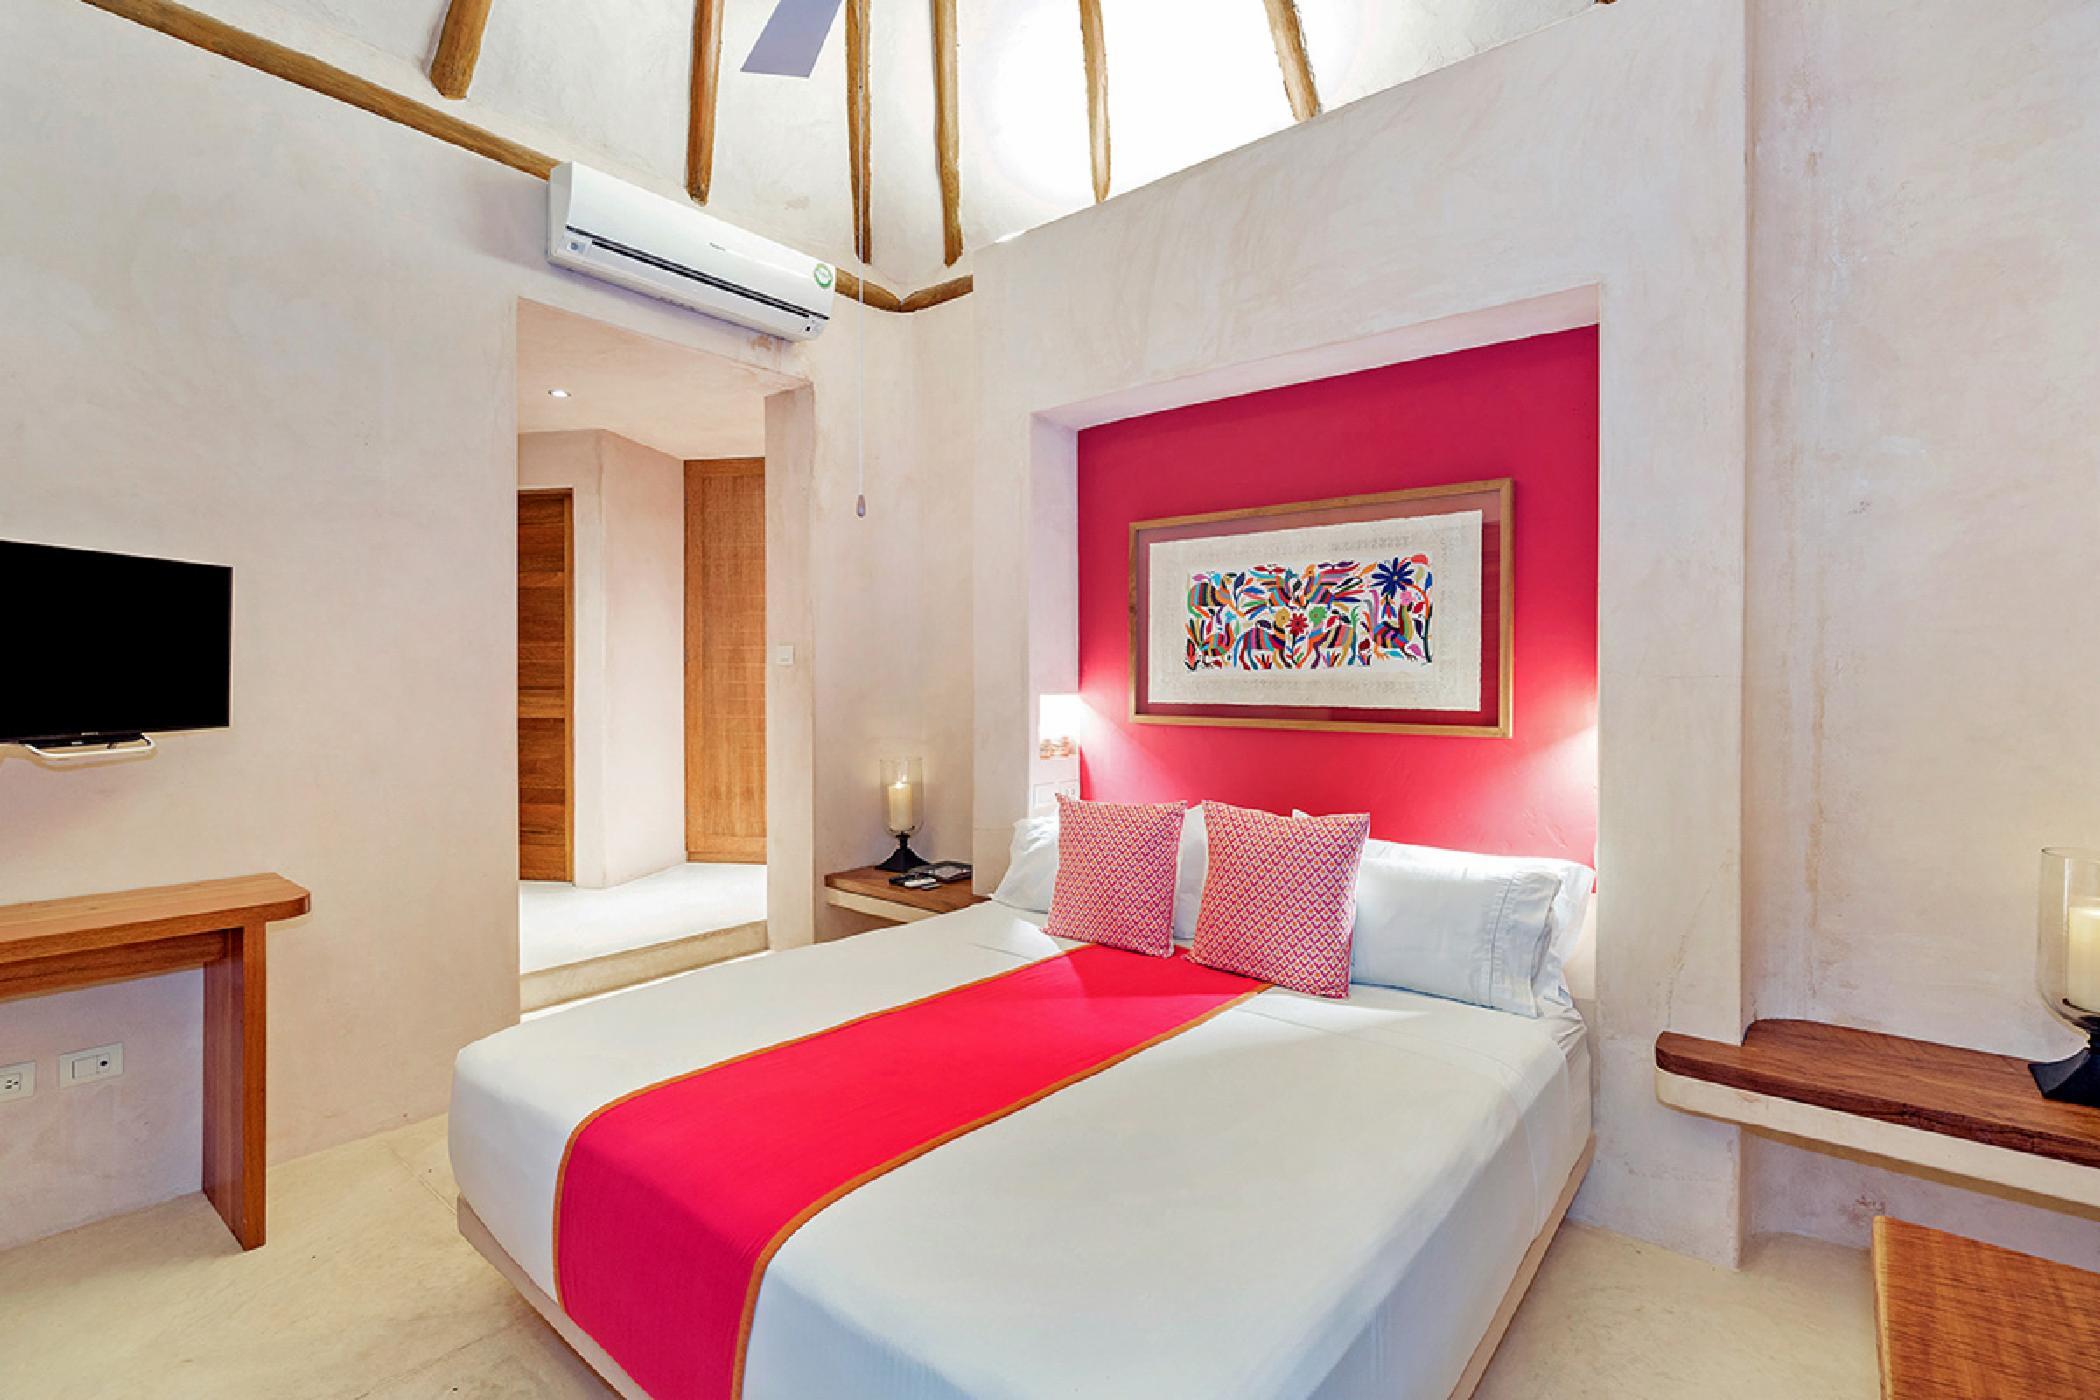 Maya_Luxe_Riviera_Maya_Luxury_Villas_Experiences_Sian_Kaan_Tulum_4_Bedrooms_Casa_Cantarena_18.jpg